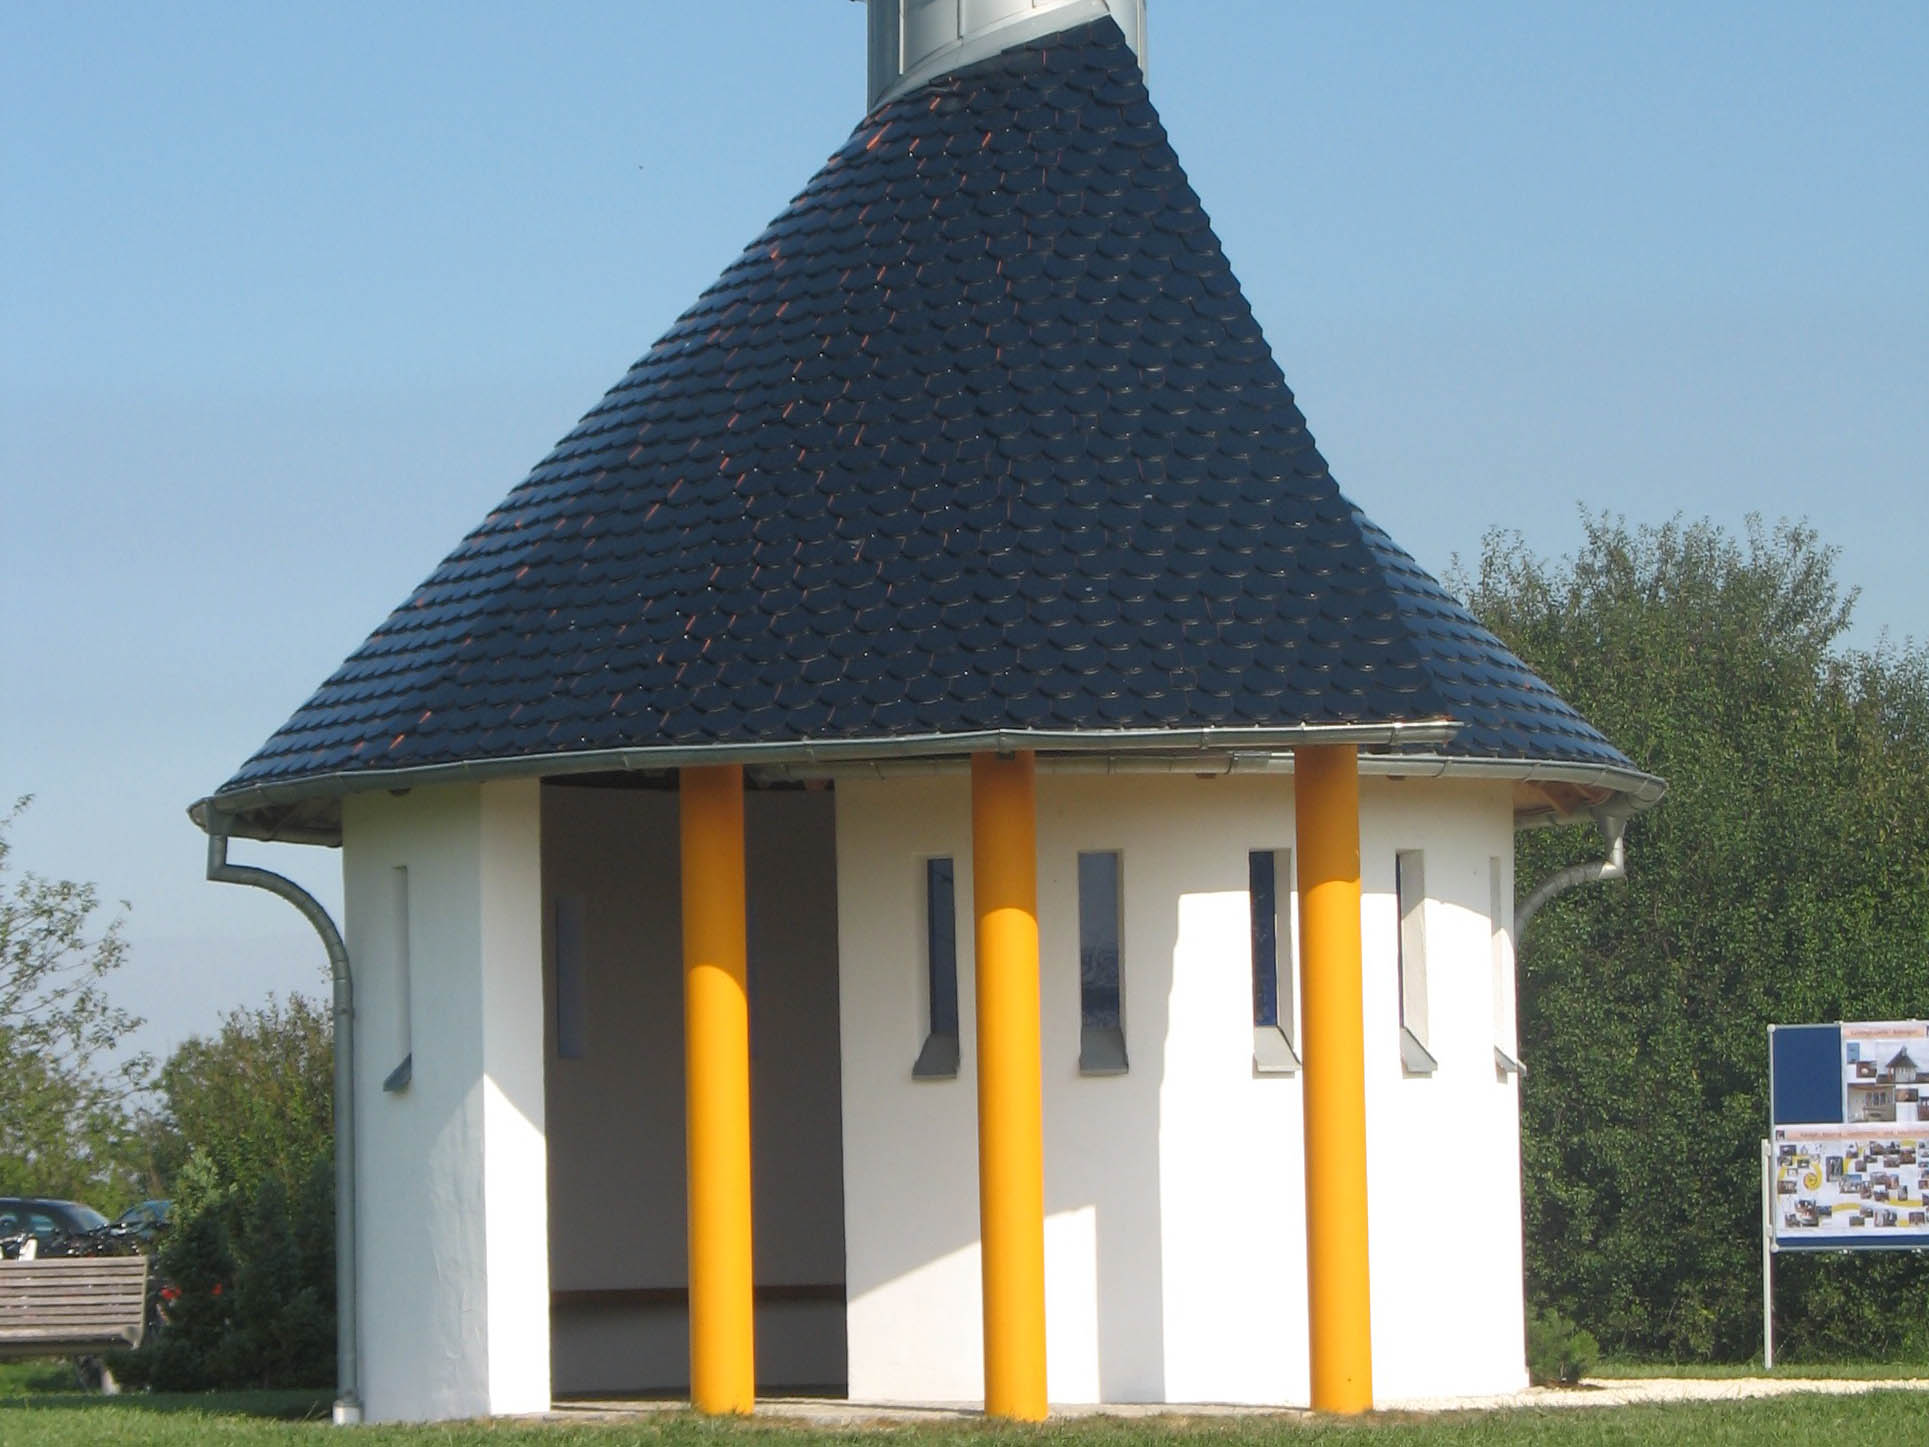 Die Kolping-Kapelle in Bobingen: Eines der 31 Ausflugsziele der virtuellen Sonntagstour (Foto: Kolping Diözesanverband)